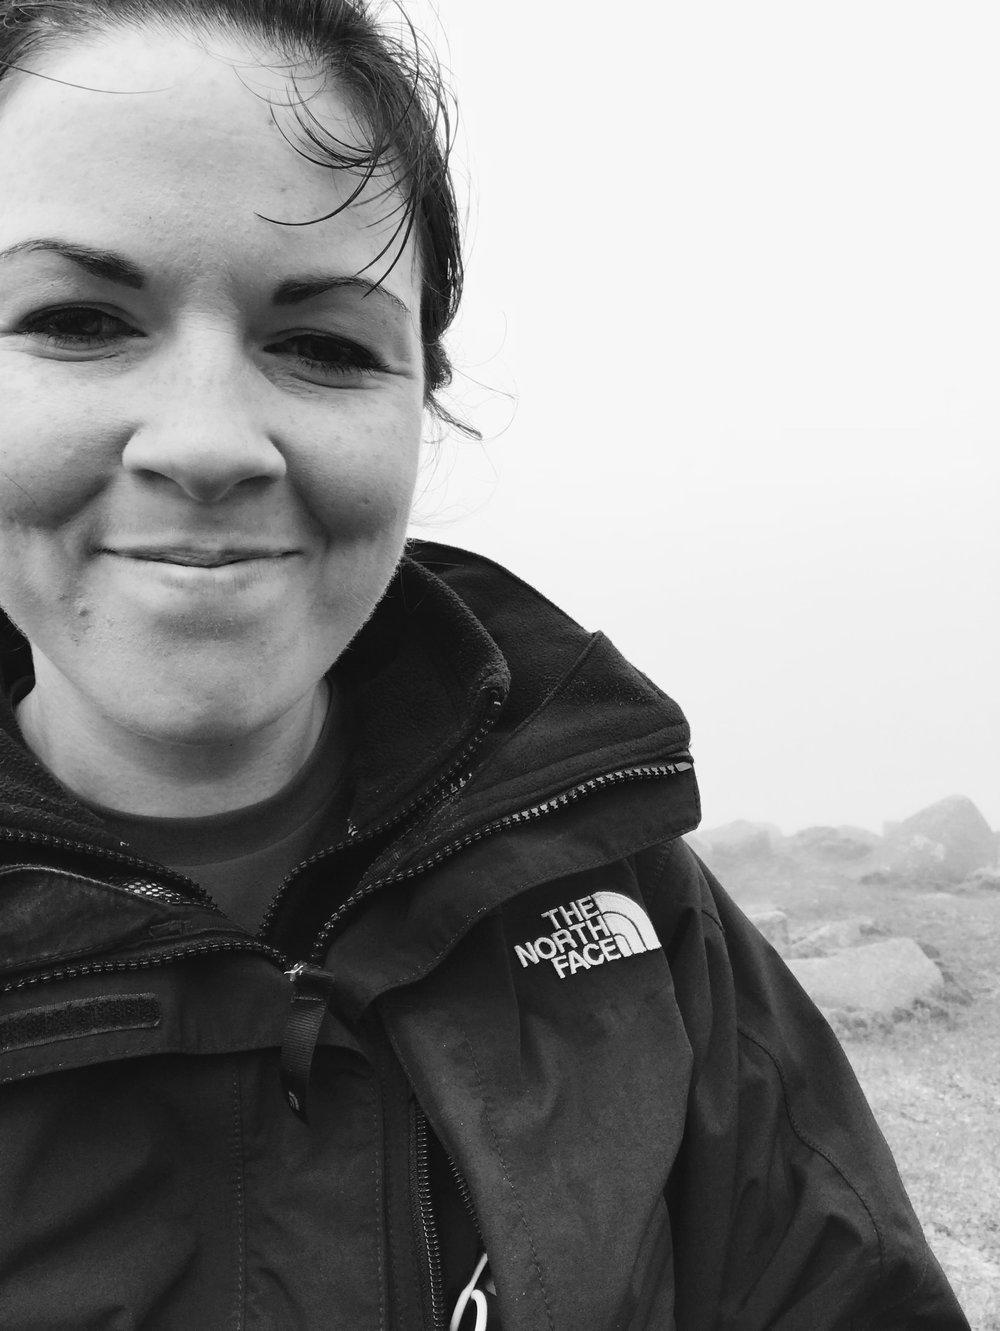 15.50pm - Bearnagh's Summit (739m)